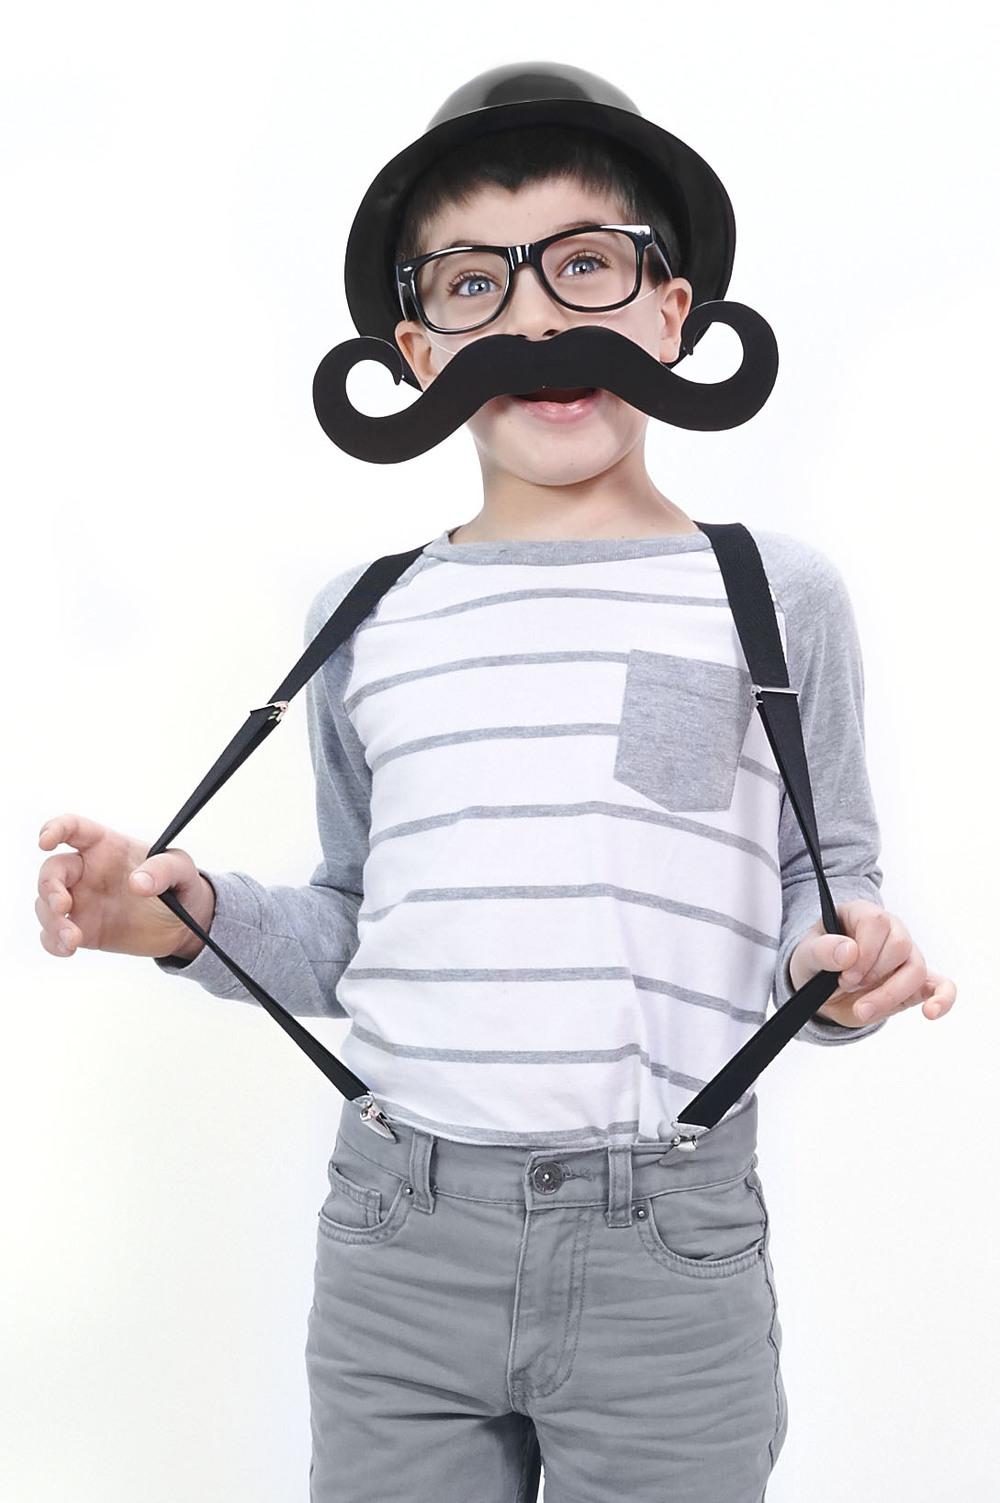 98524b_Mustache.jpg